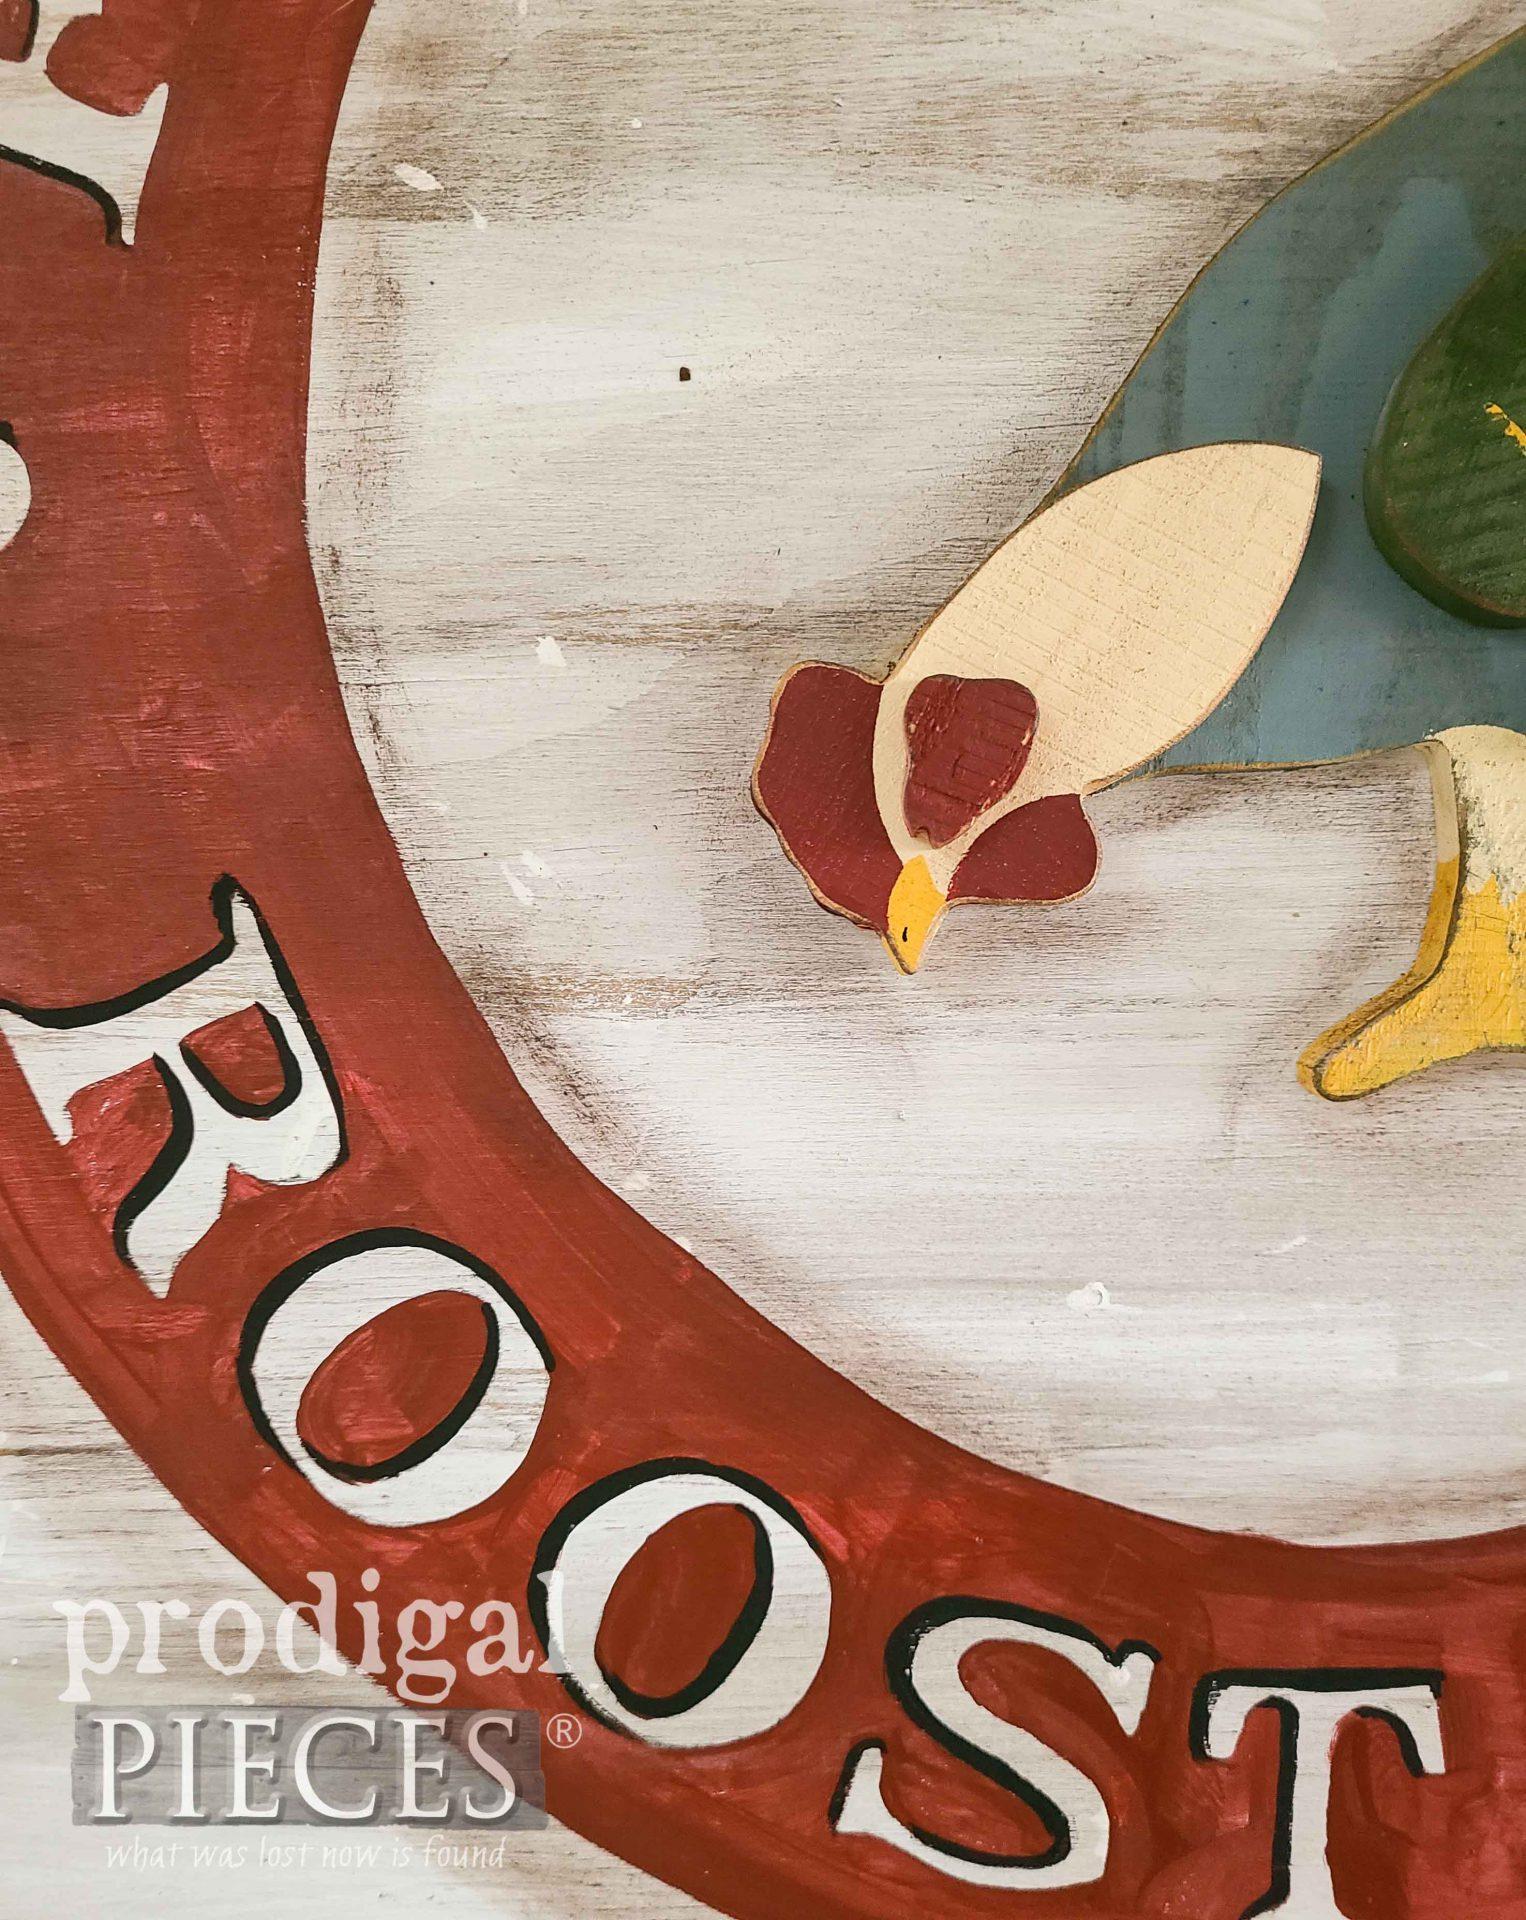 Handmade Chicken Sign Closeup by Larissa of Prodigal Pieces | prodigalpieces.com #prodigalpieces #diy #farmhouse #handmade #home #homedecor